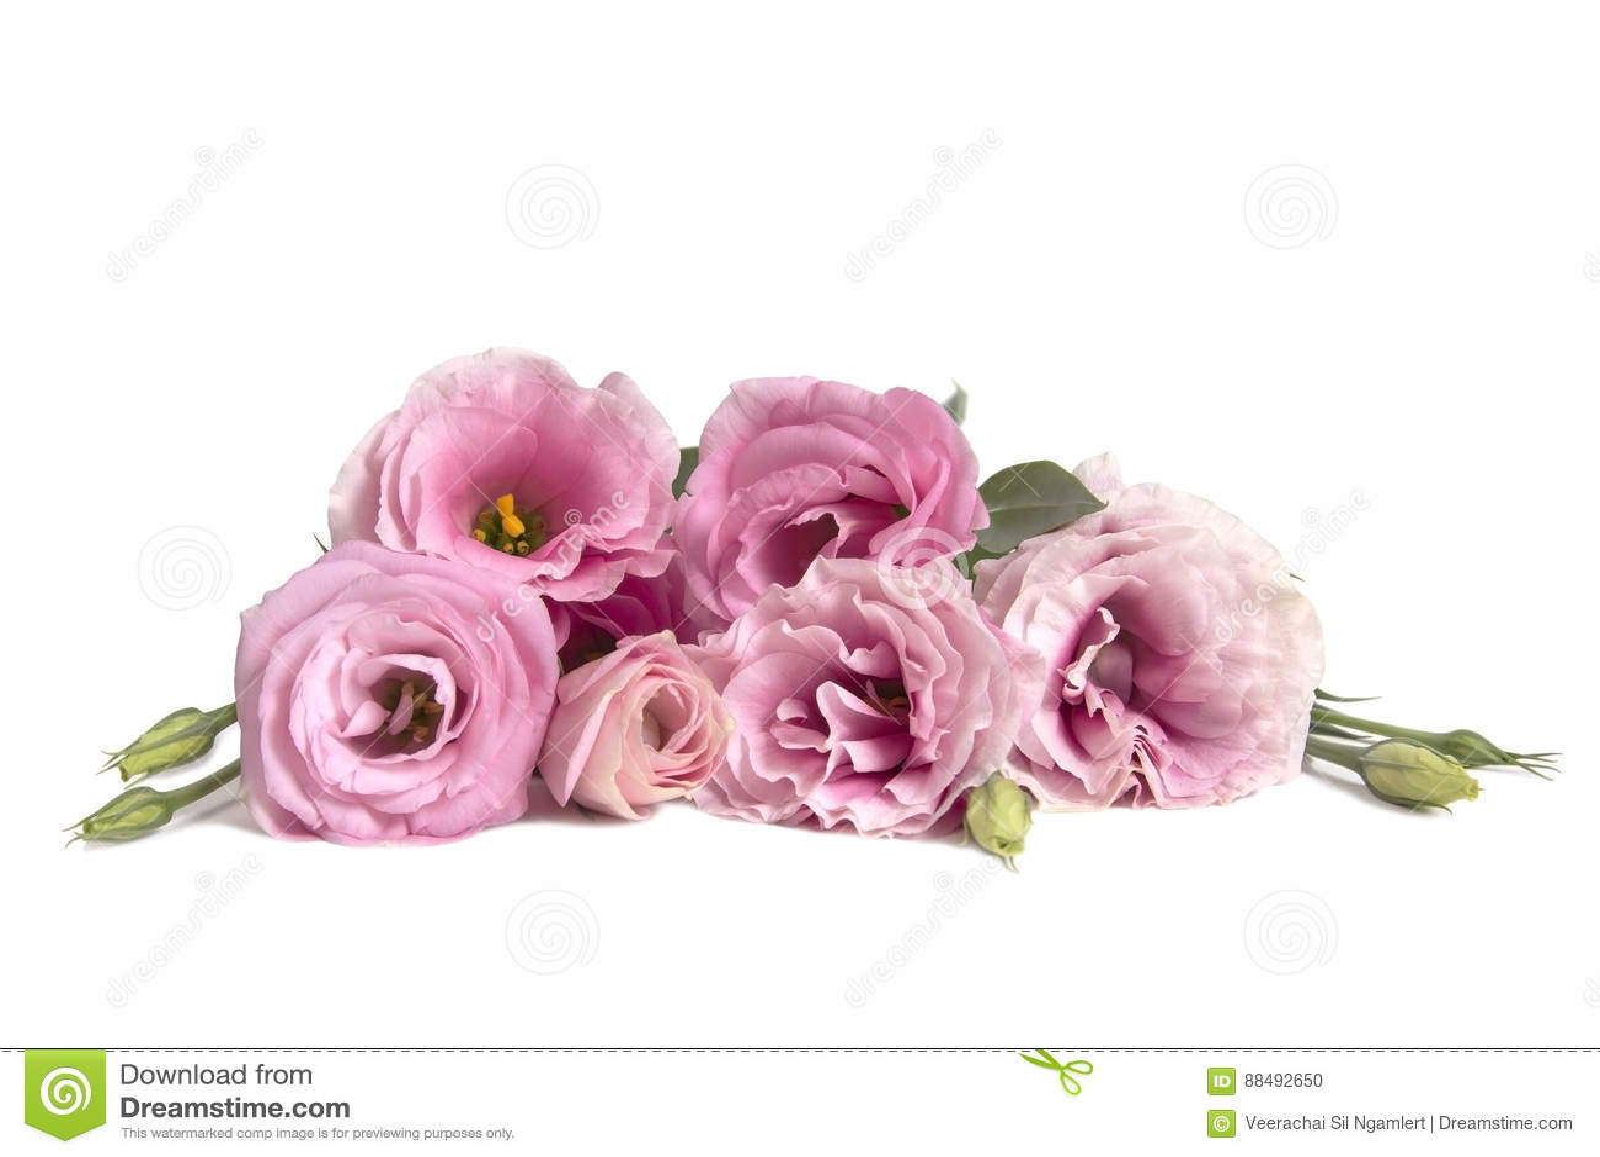 Beautiful Lisianthus Flower Bouquet On White Background Stock Photo